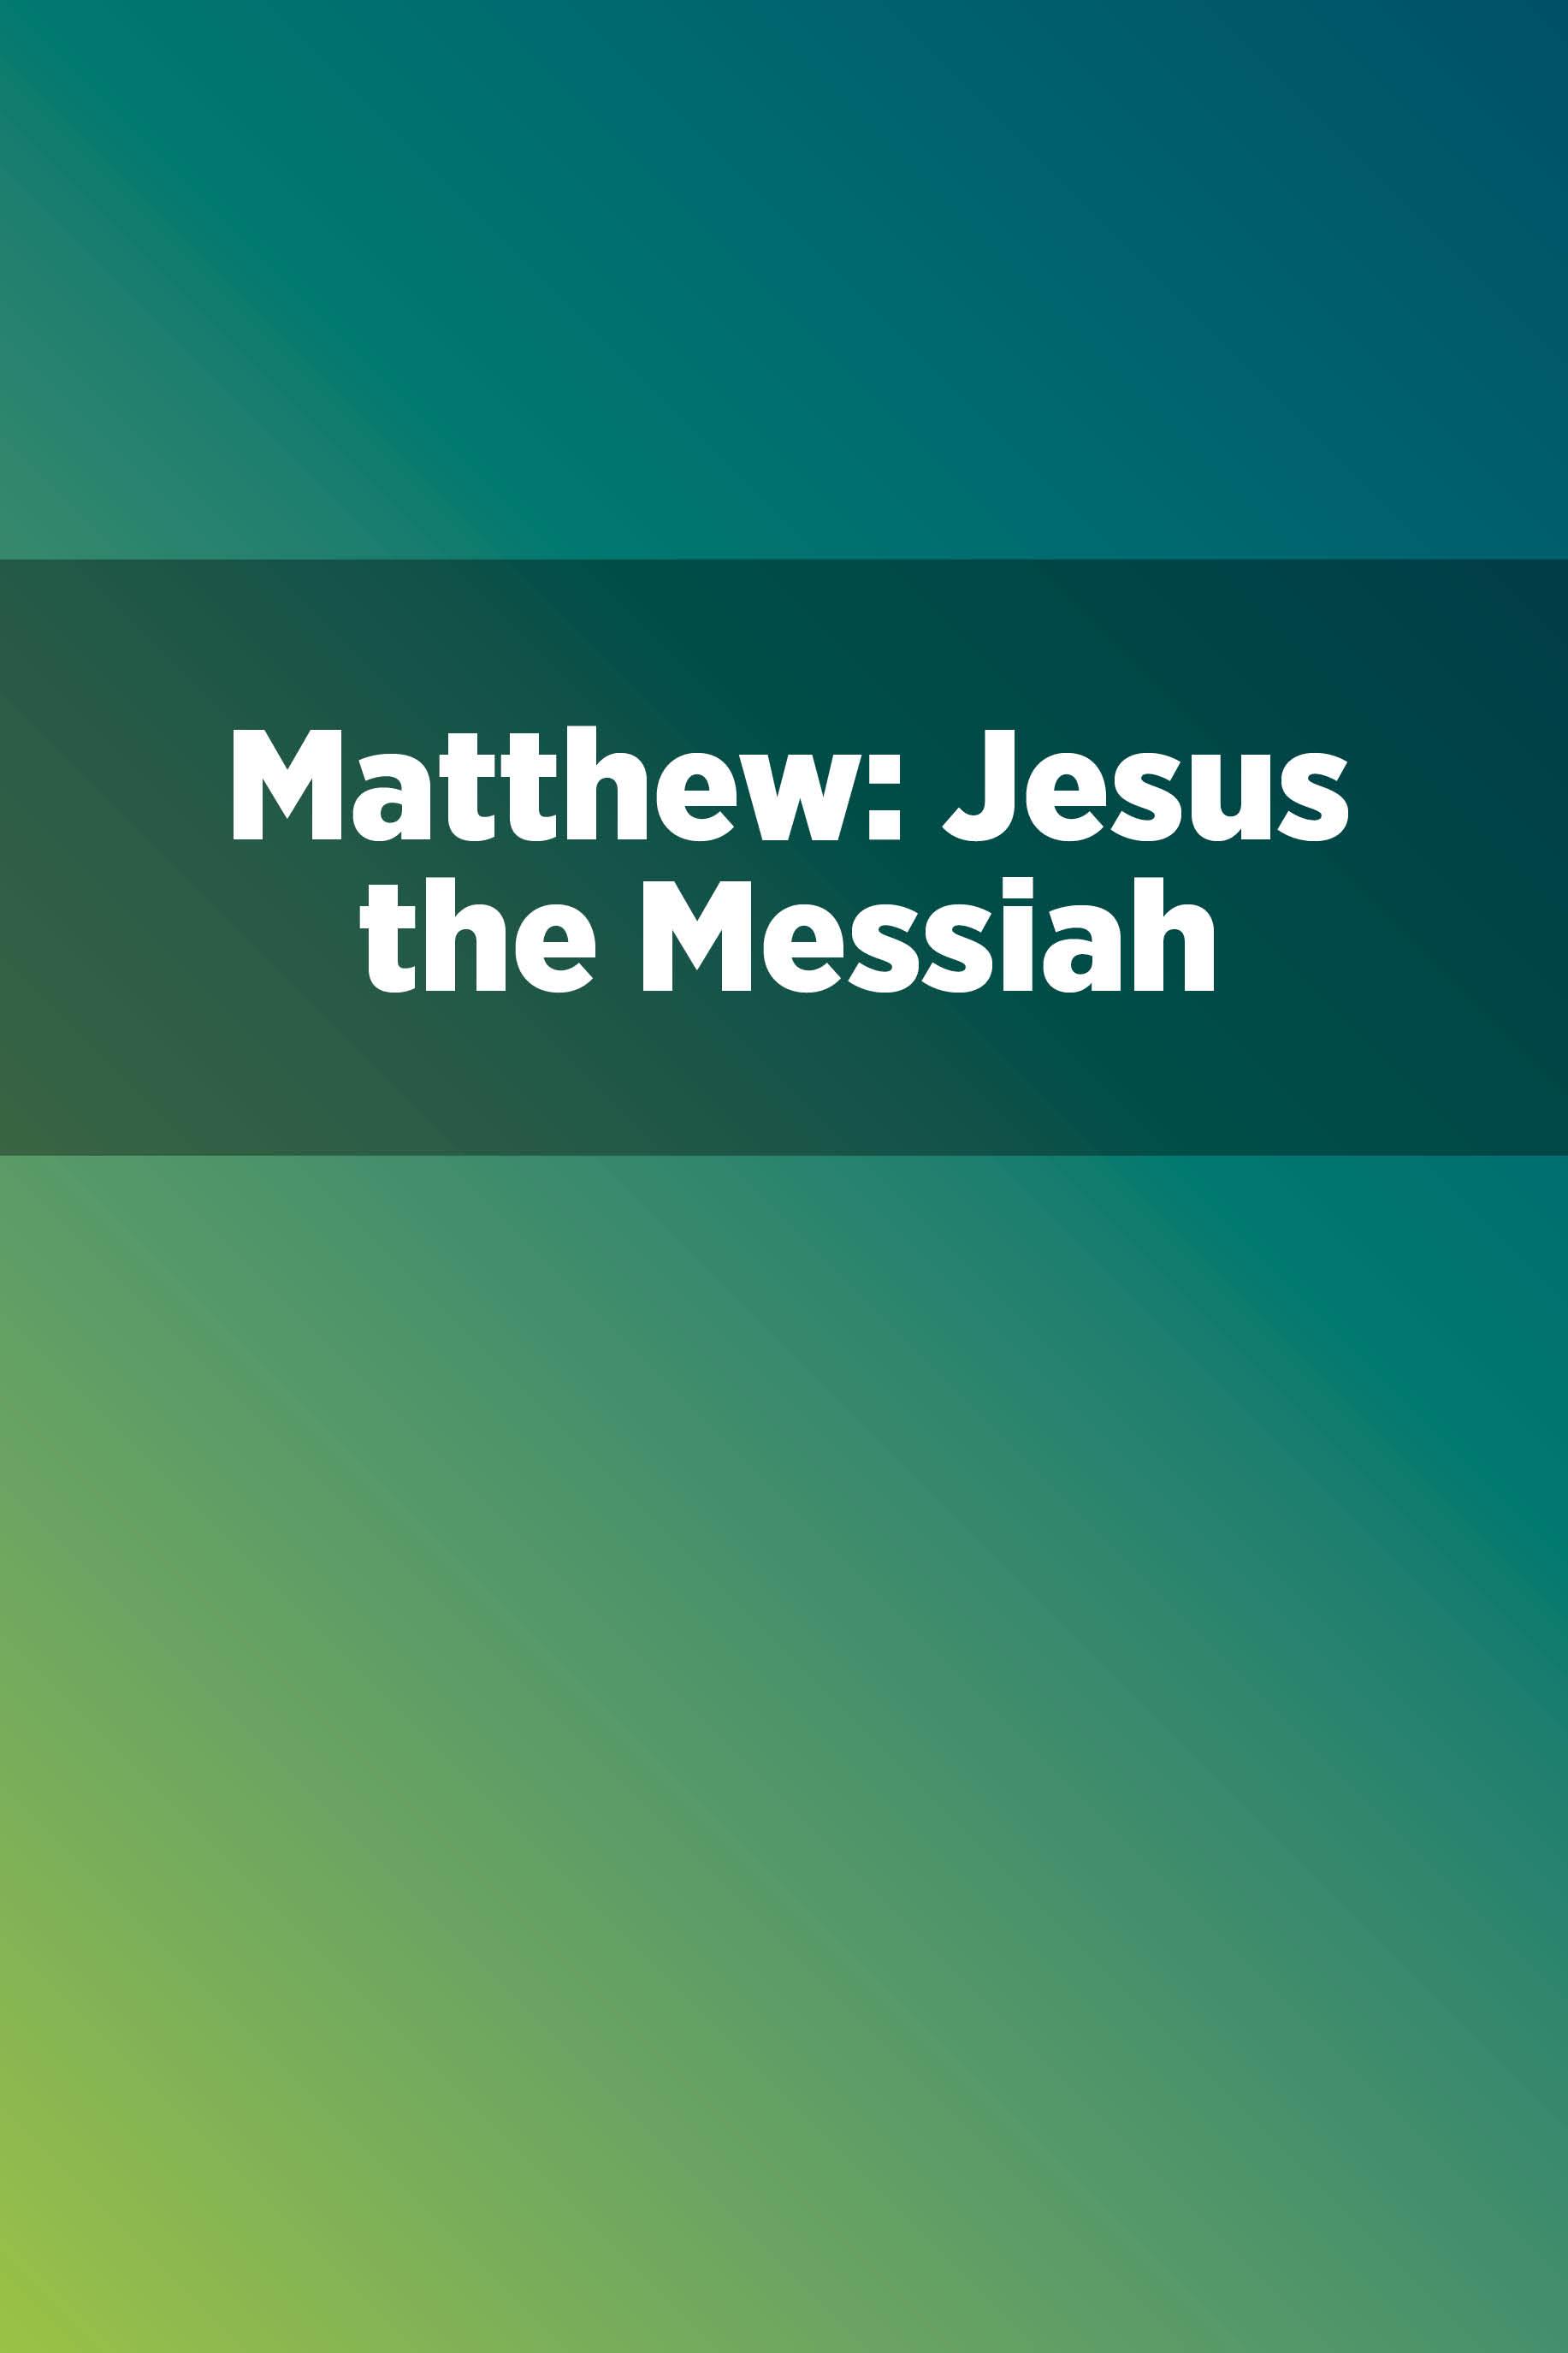 Matthew: Jesus the Messiah